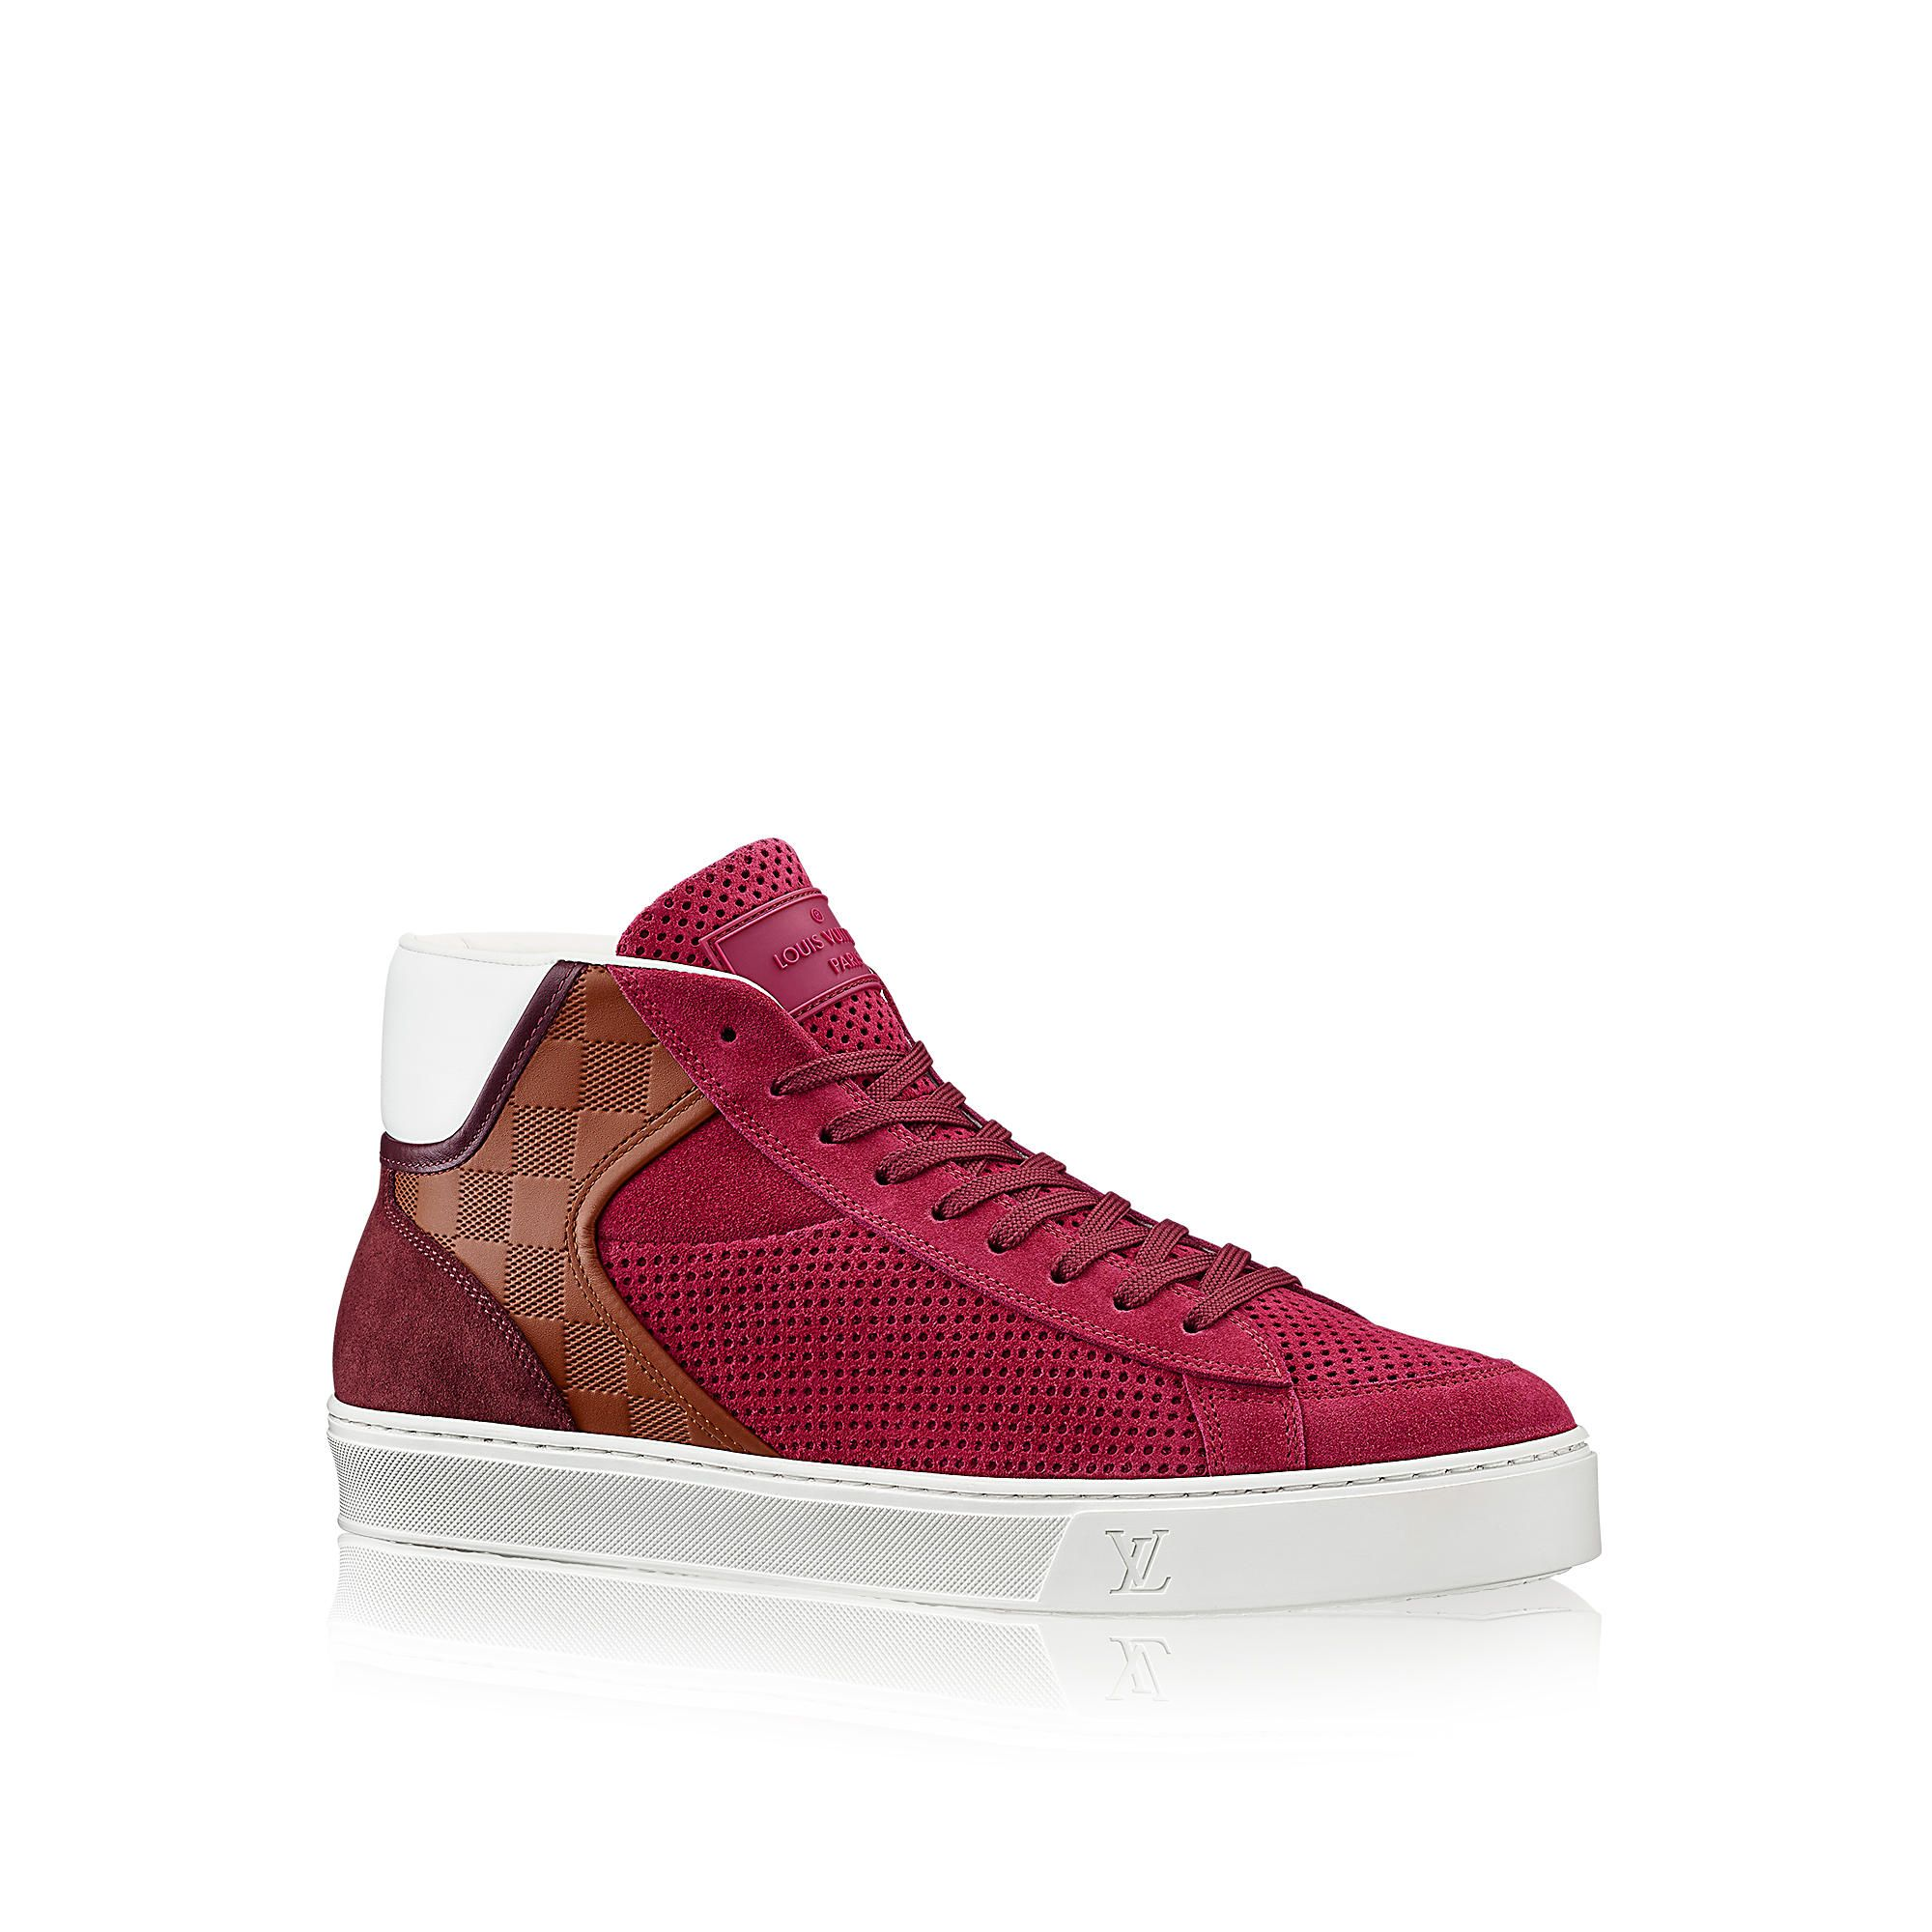 Louis vuitton fastball sneakers ebay